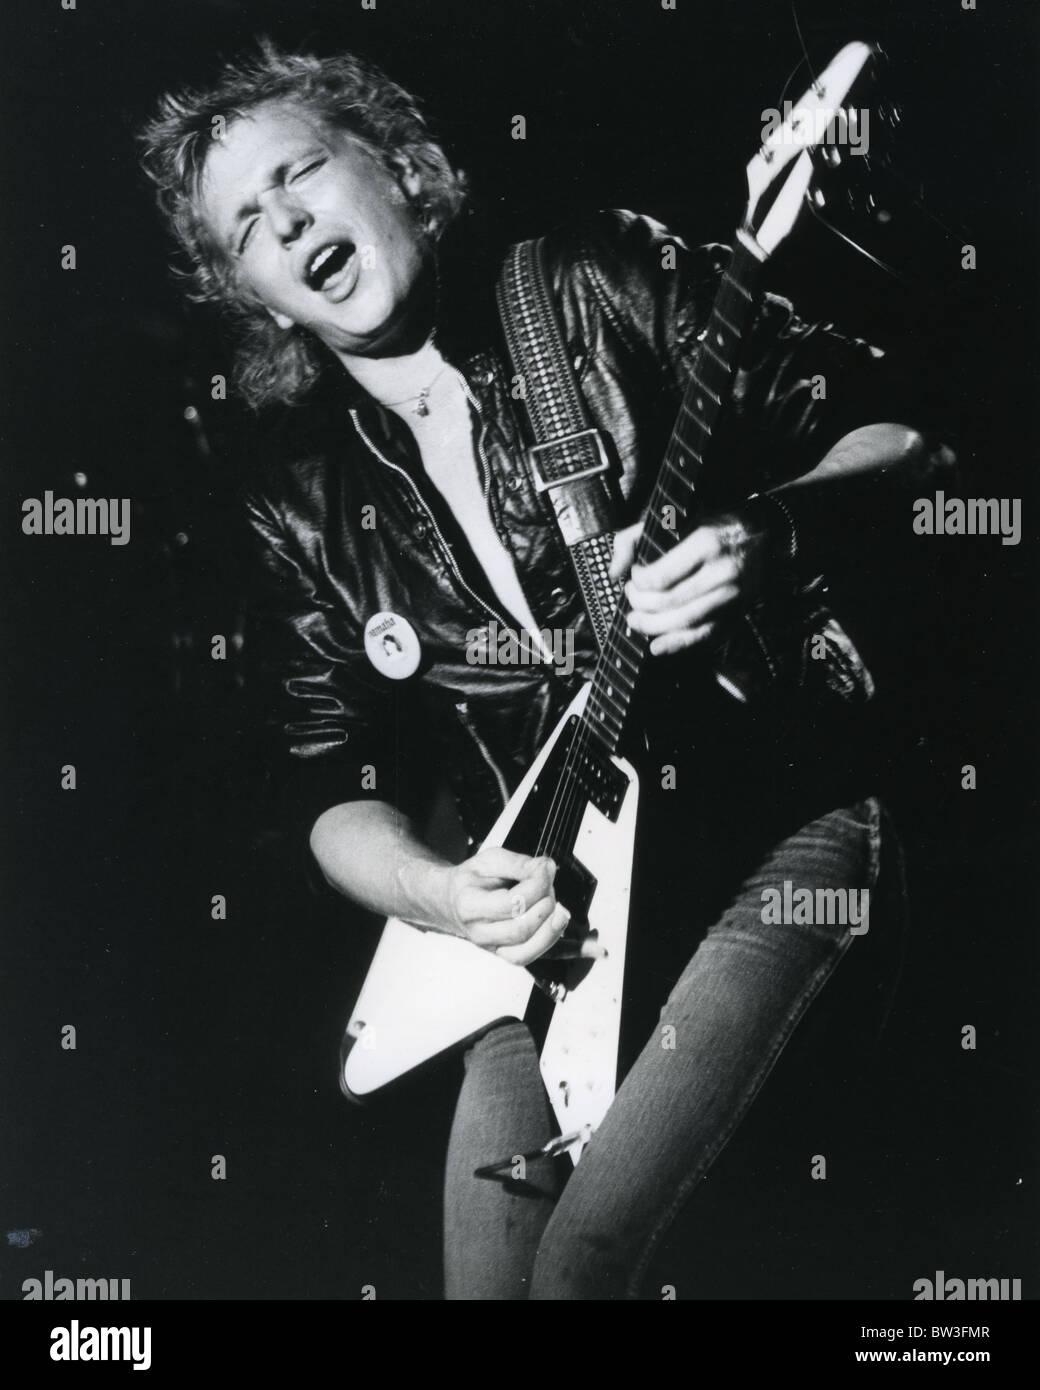 Michael Schenker Guitarrista De Rock Alemán En 1981 Foto